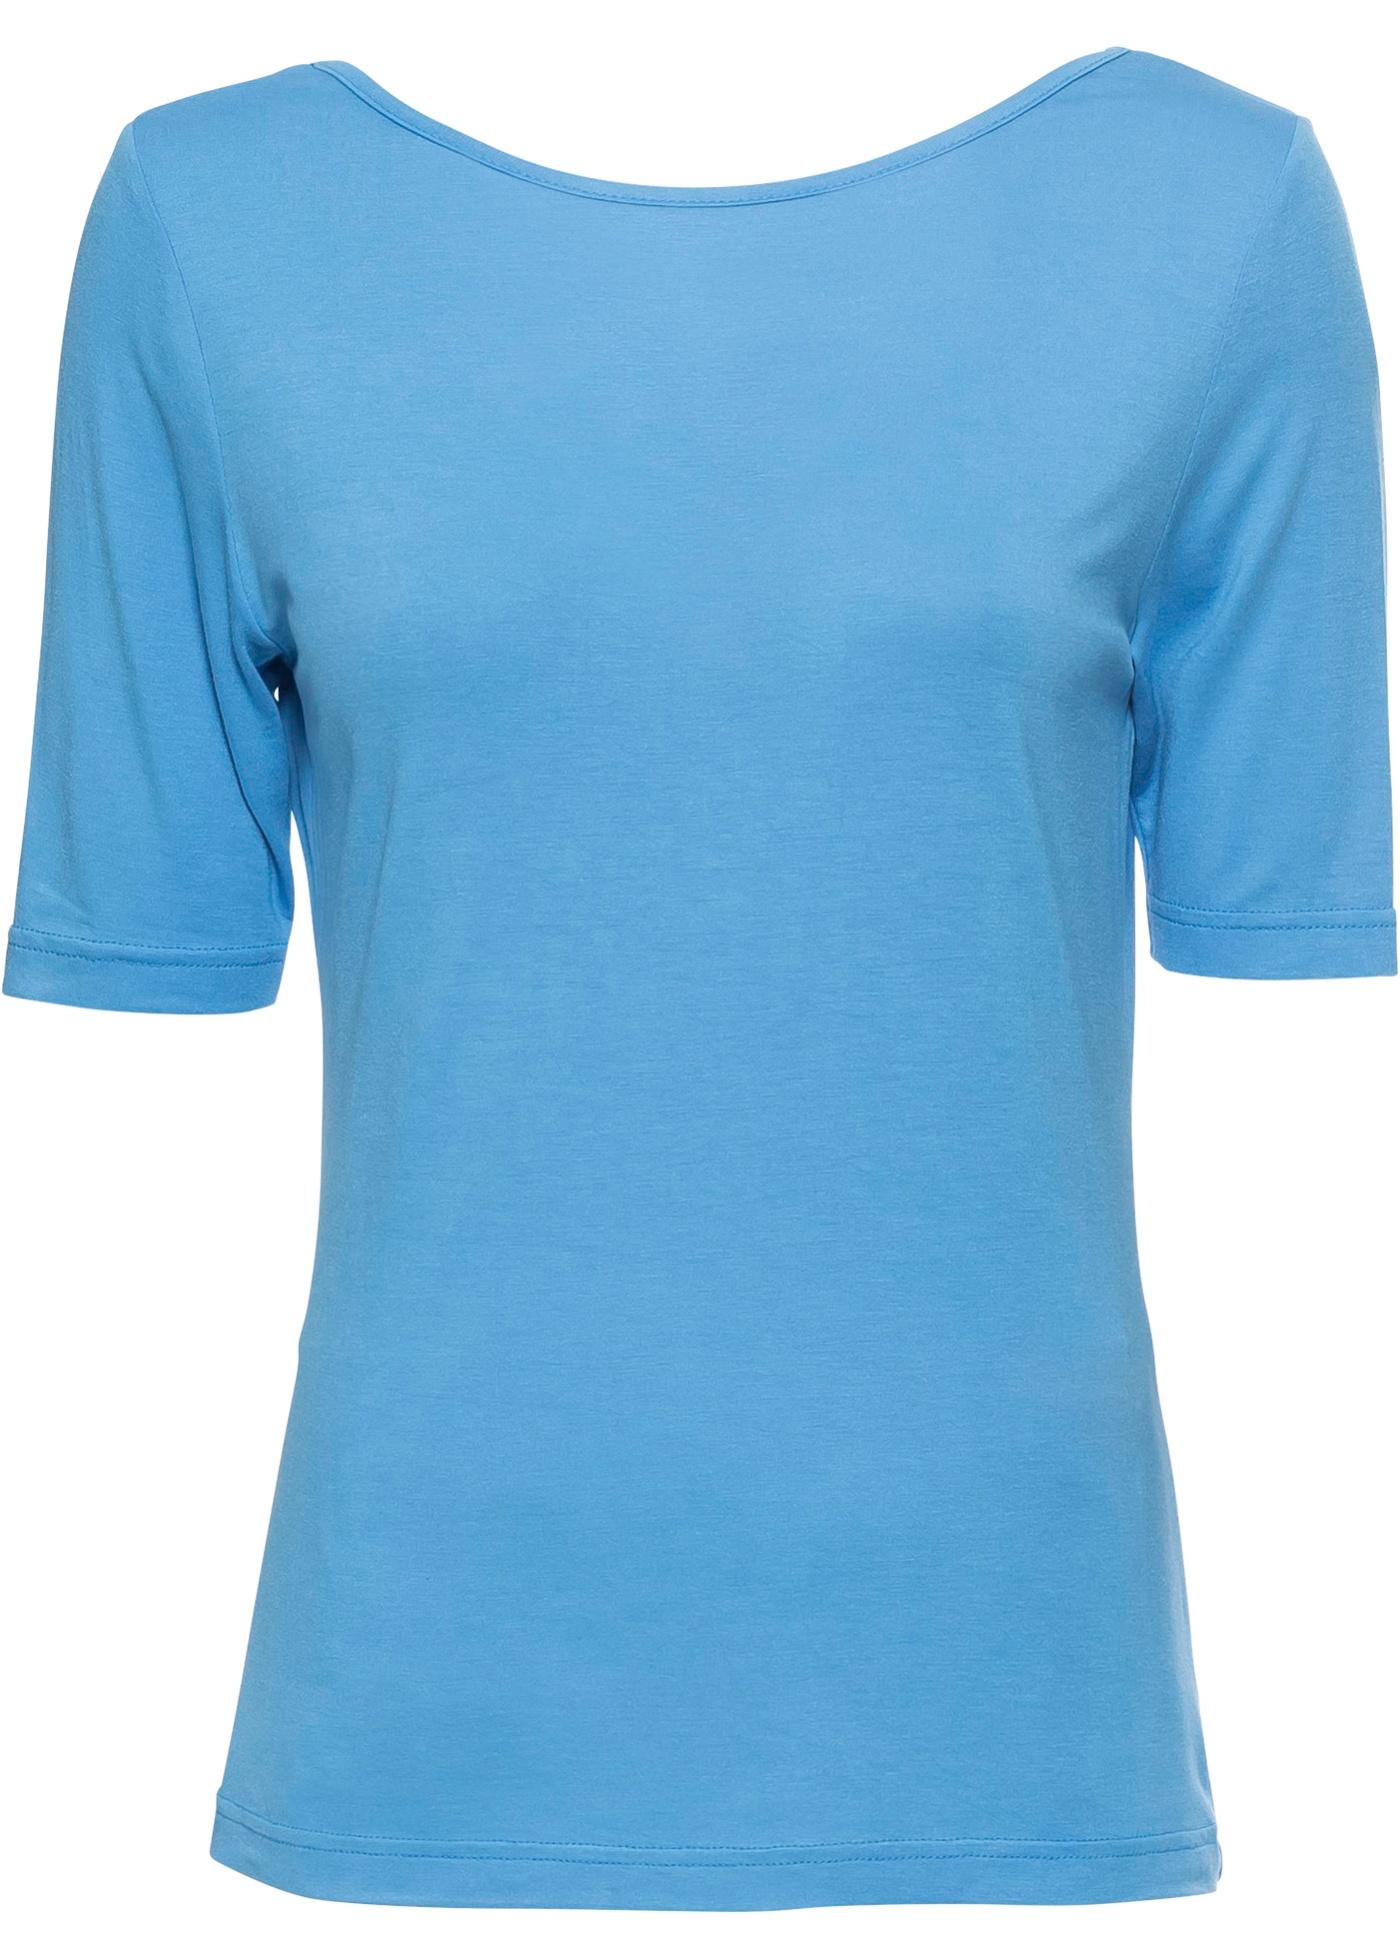 Pour Femme longues shirt Manches Mi Bleu Bodyflirt BonprixT H9e2bEWIDY